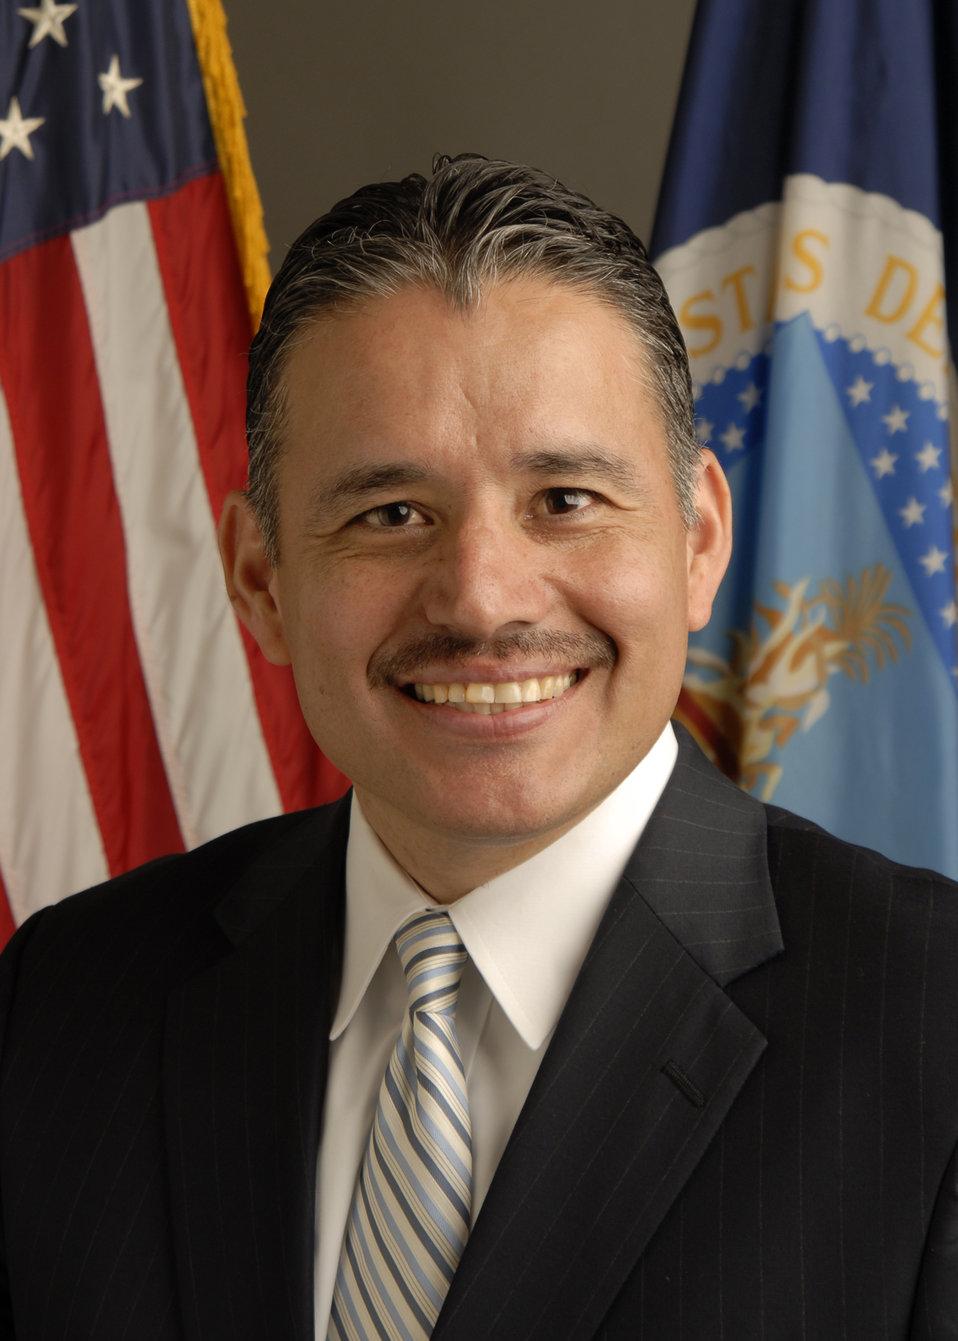 20110524-DM-KJH Deputy Assistant Secretary for Administration Oscar Gonzales